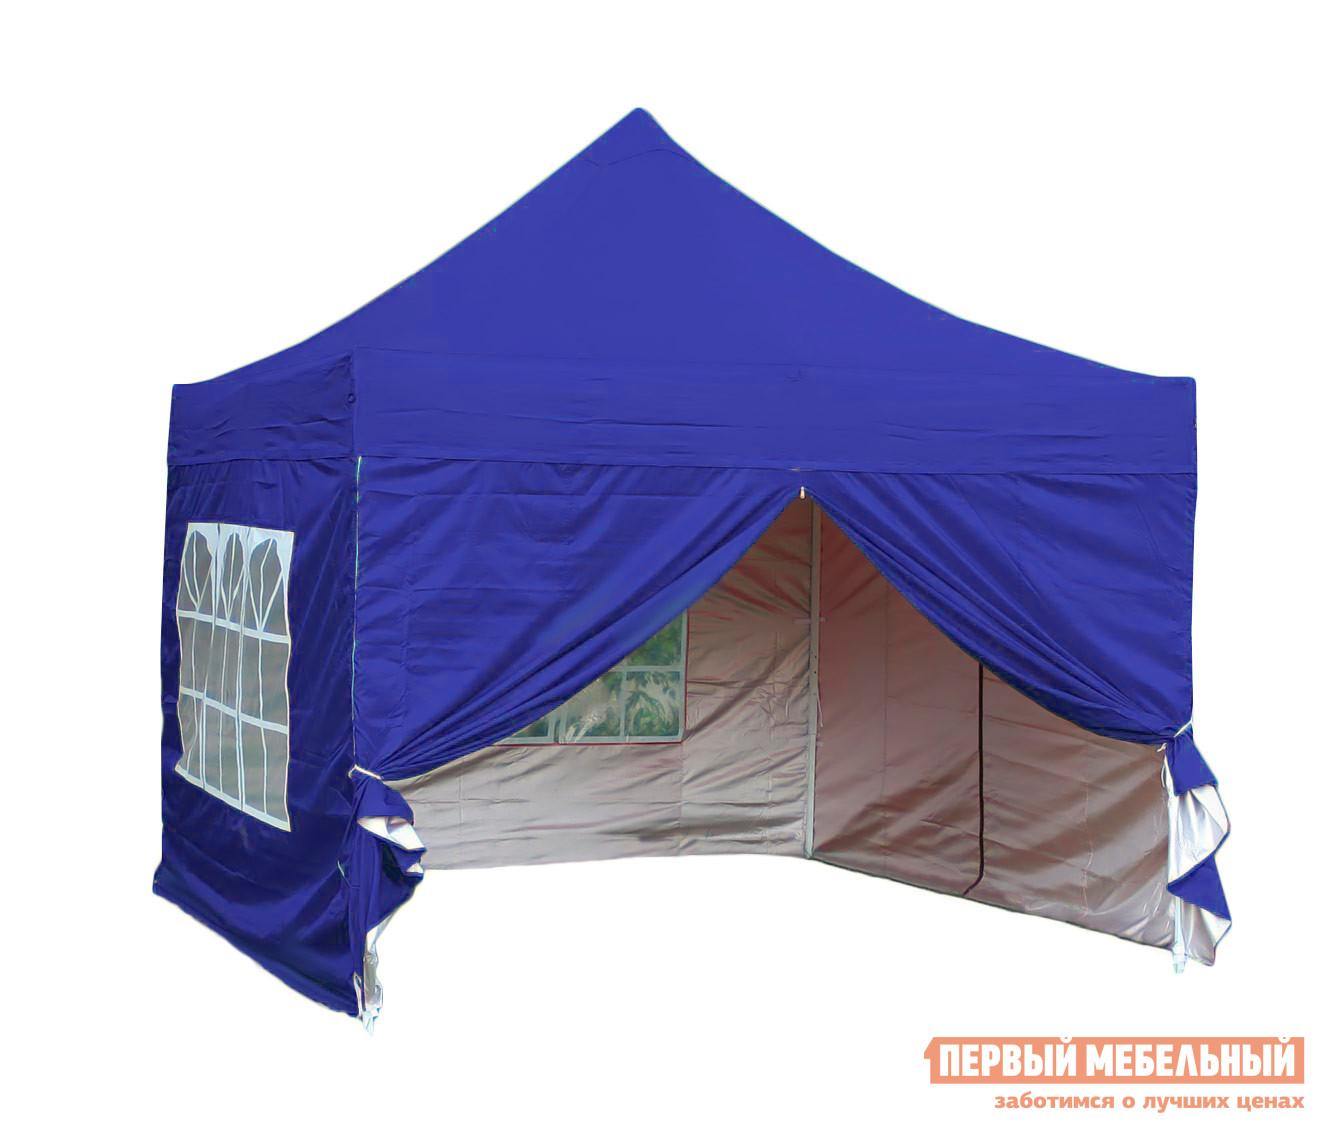 Раздвижной шатер-гармошка Giza Garden Гиза Эко 3х3 раздвижной шатер гармошка giza garden гиза эко 3х3